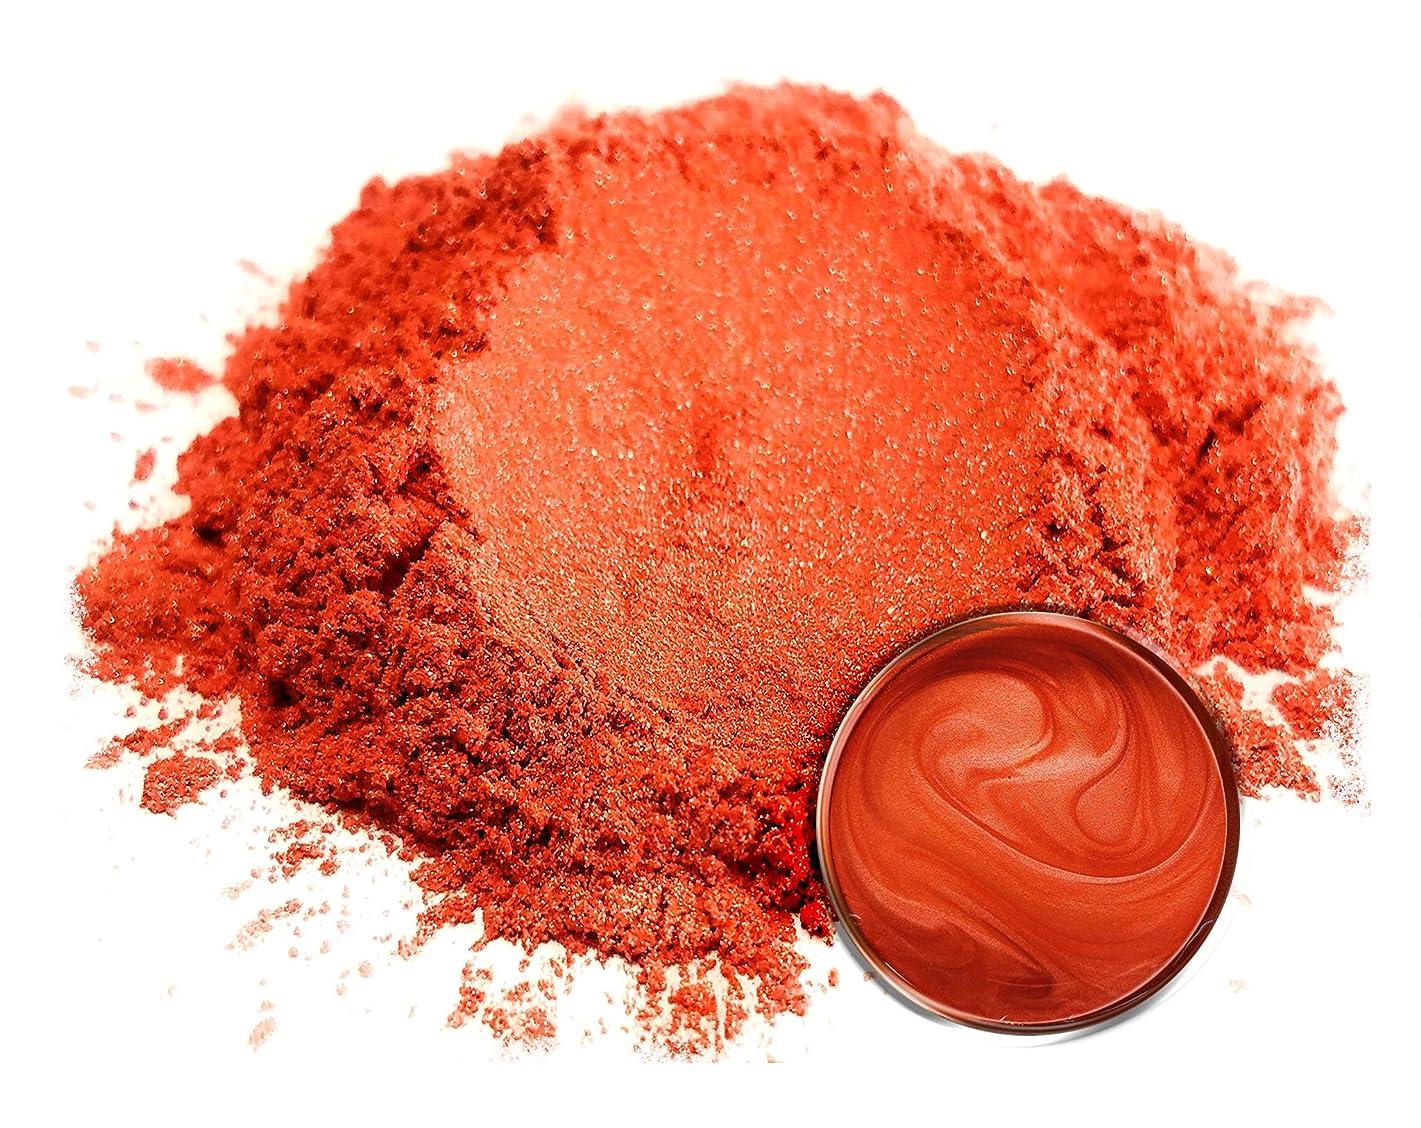 "Eye Candy Mica Powder Pigment ""Tiger"" (50g) Multipurpose DIY Arts and Crafts Additive | Natural Bath Bombs, Resin, Paint, Epoxy, Soap, Nail Polish, Lip Balm"